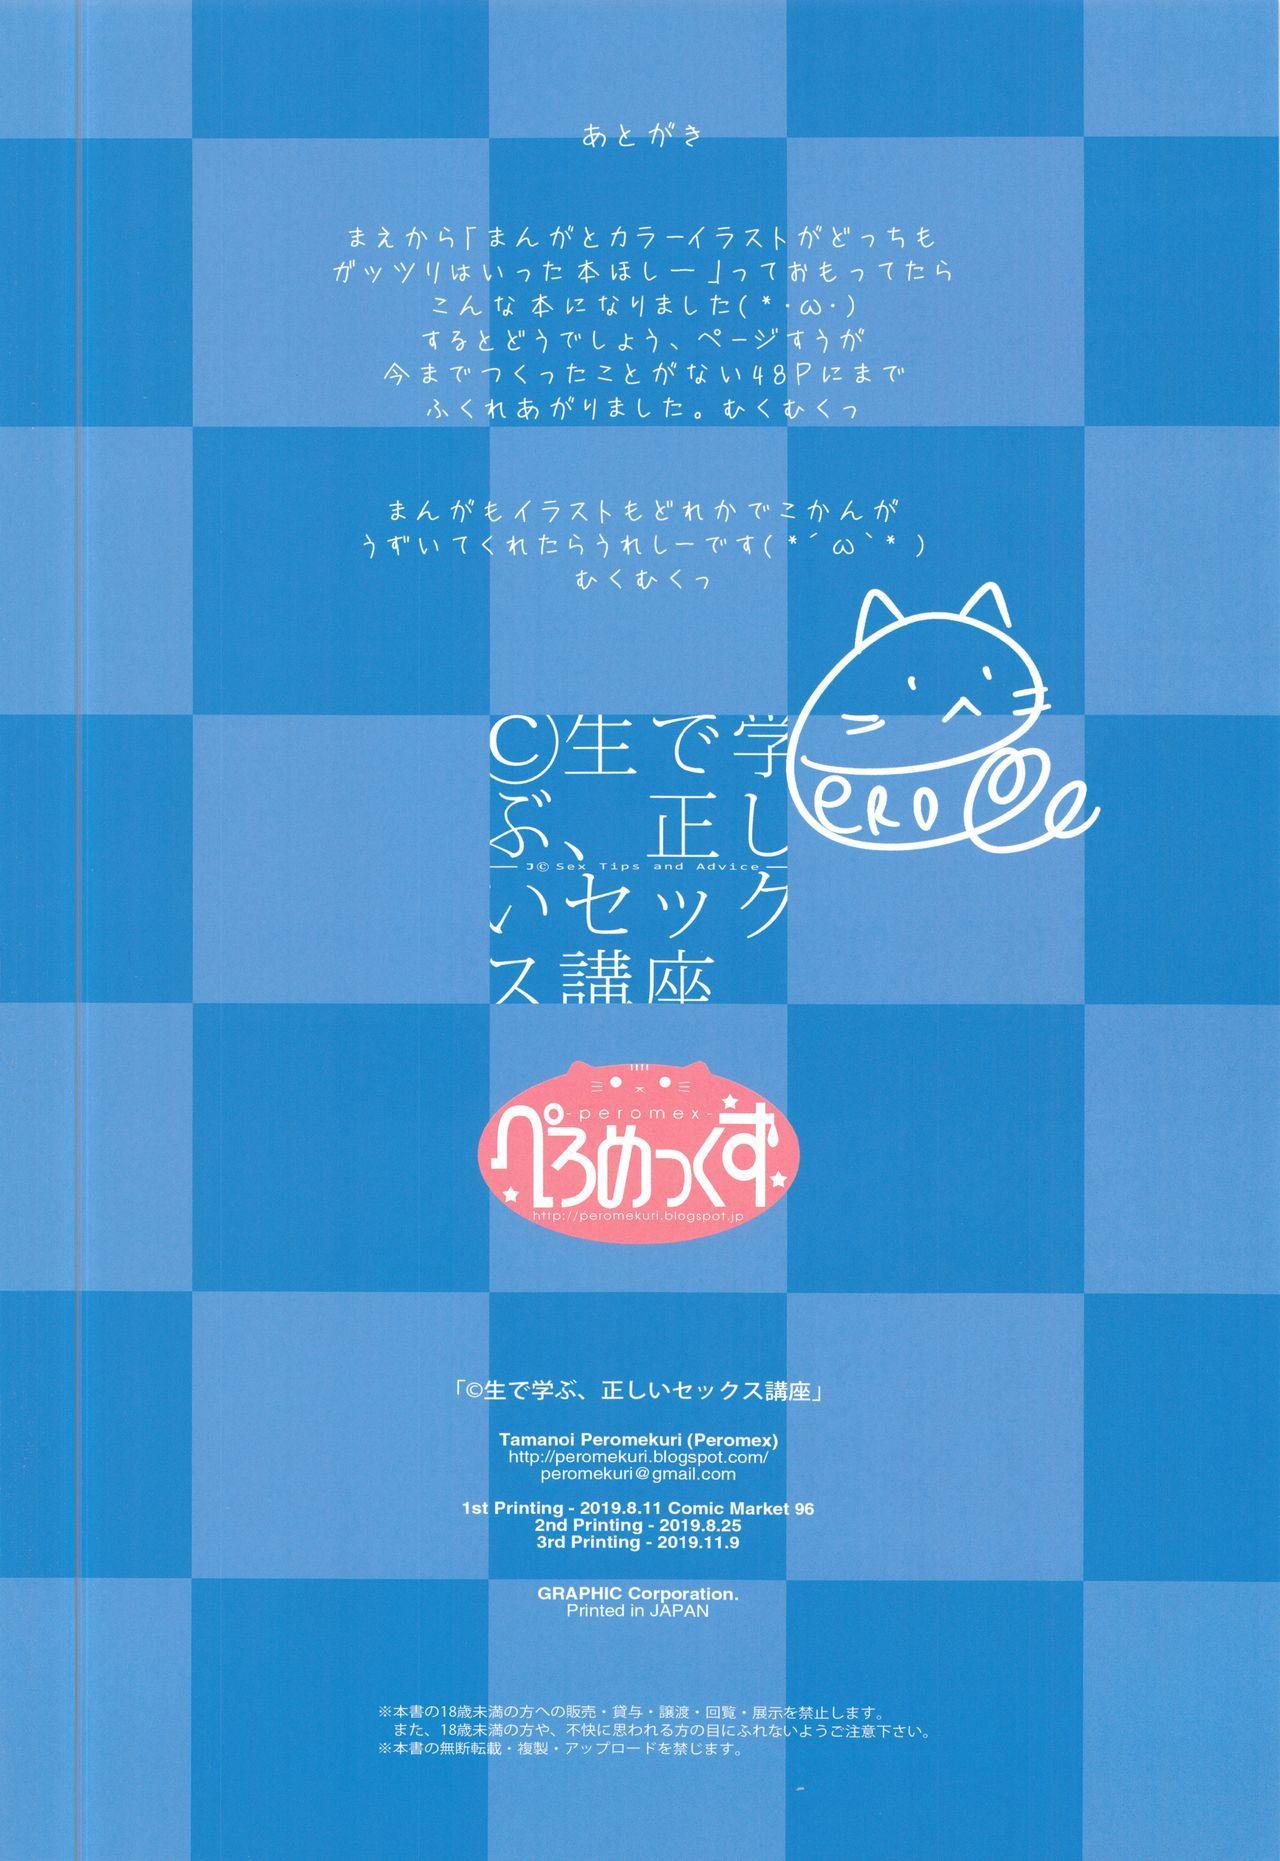 [Peromex (Tamanoi Peromekuri)] ©-sei de Manabu, Tadashii Sex Kouza   JC Hands-On Proper Sex Lecture [English] [bientaimon] [2019-11-09] 44